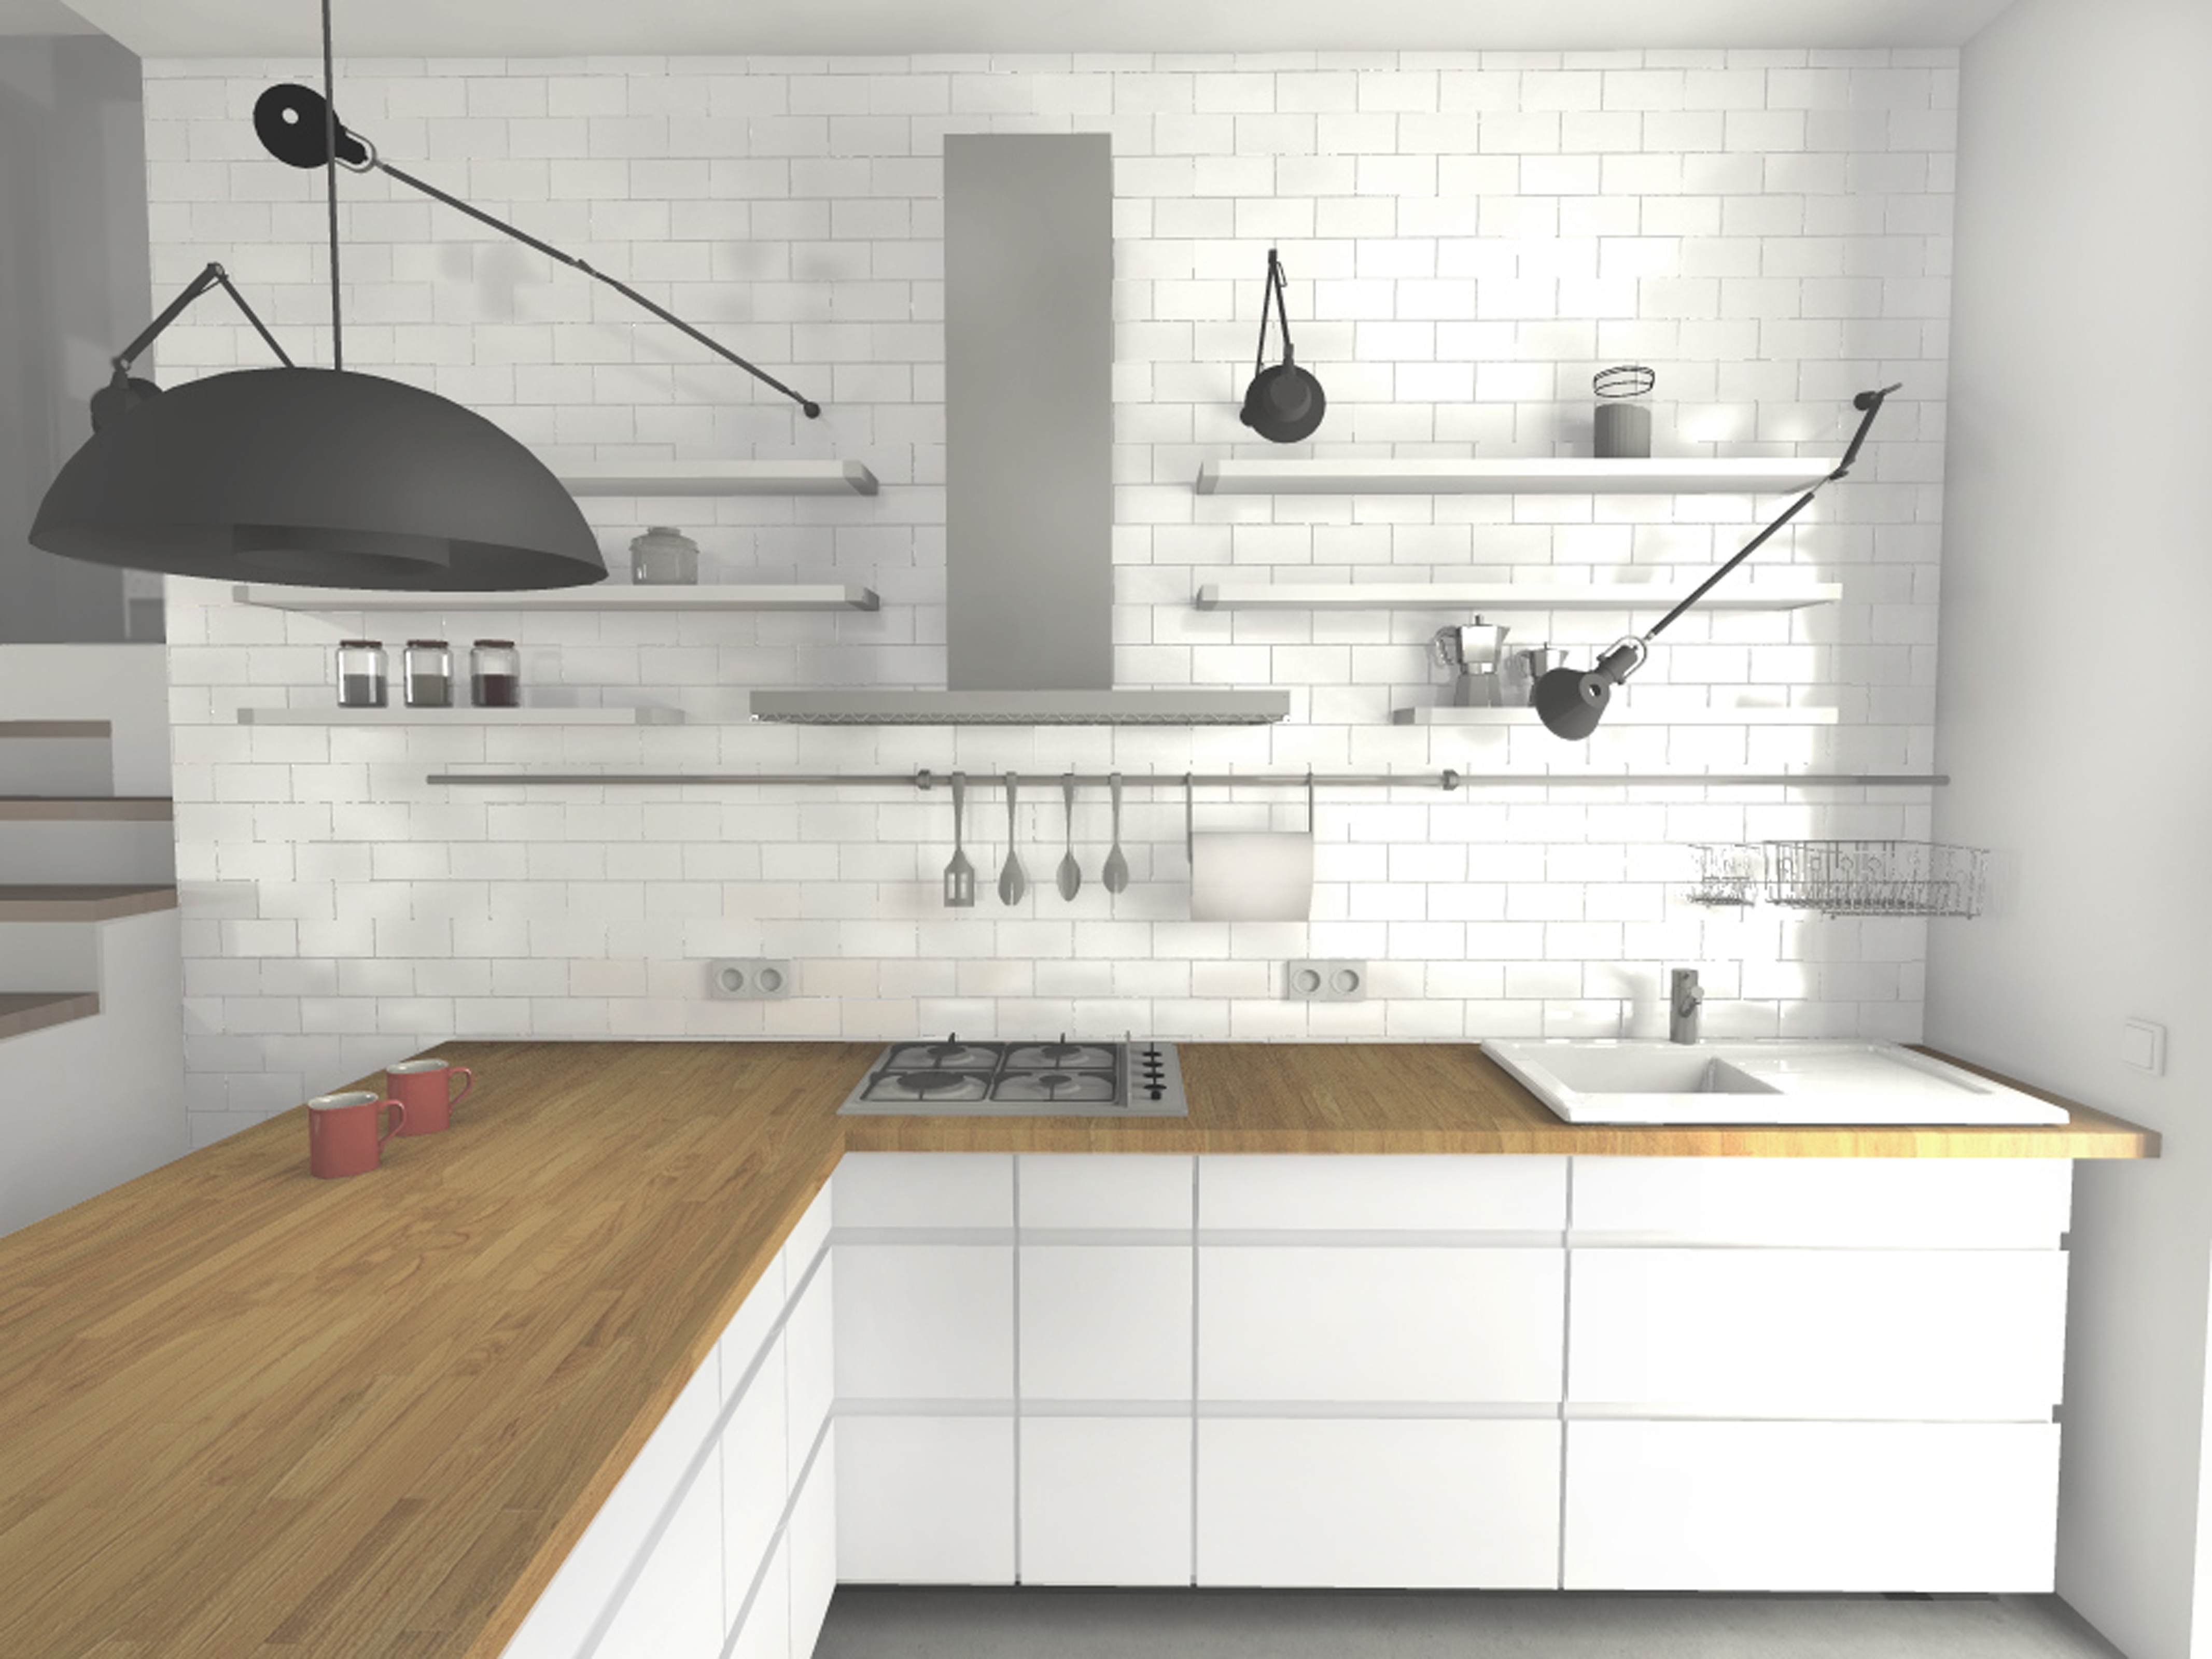 Kuchnia W Stylu Skandynawskim Marmur Studio L